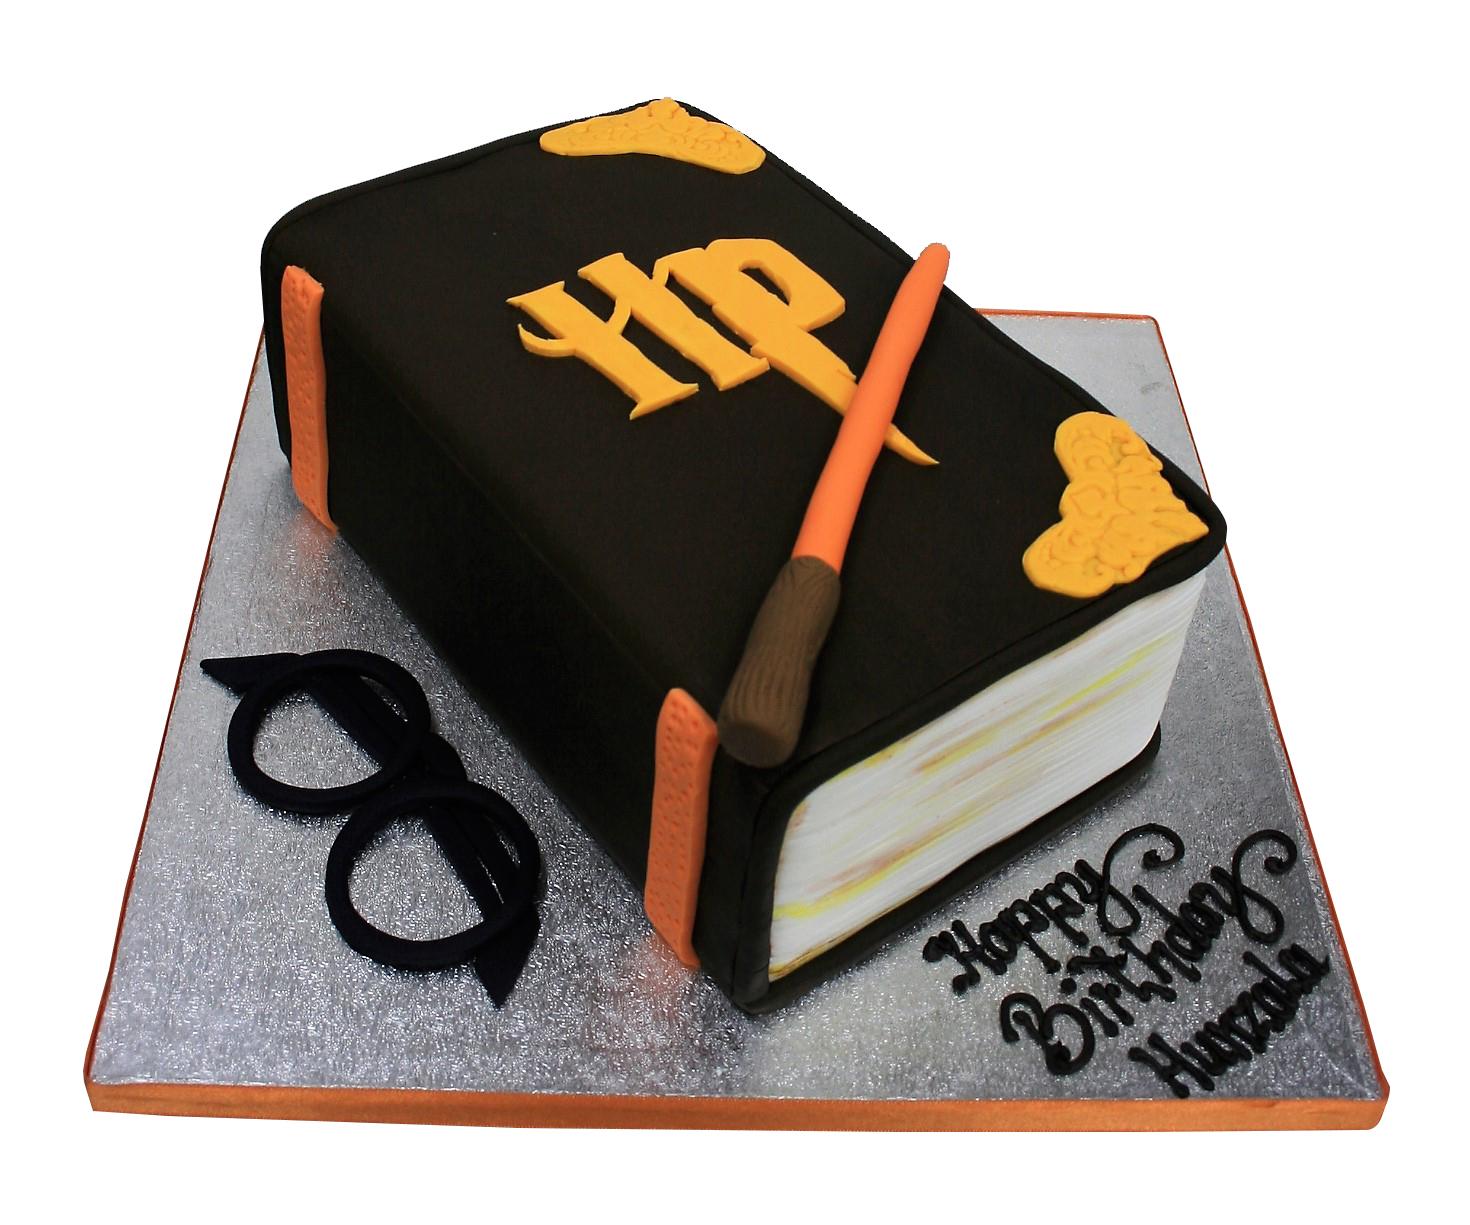 Sensational Harry Potter Book Birthday Cake Funny Birthday Cards Online Alyptdamsfinfo